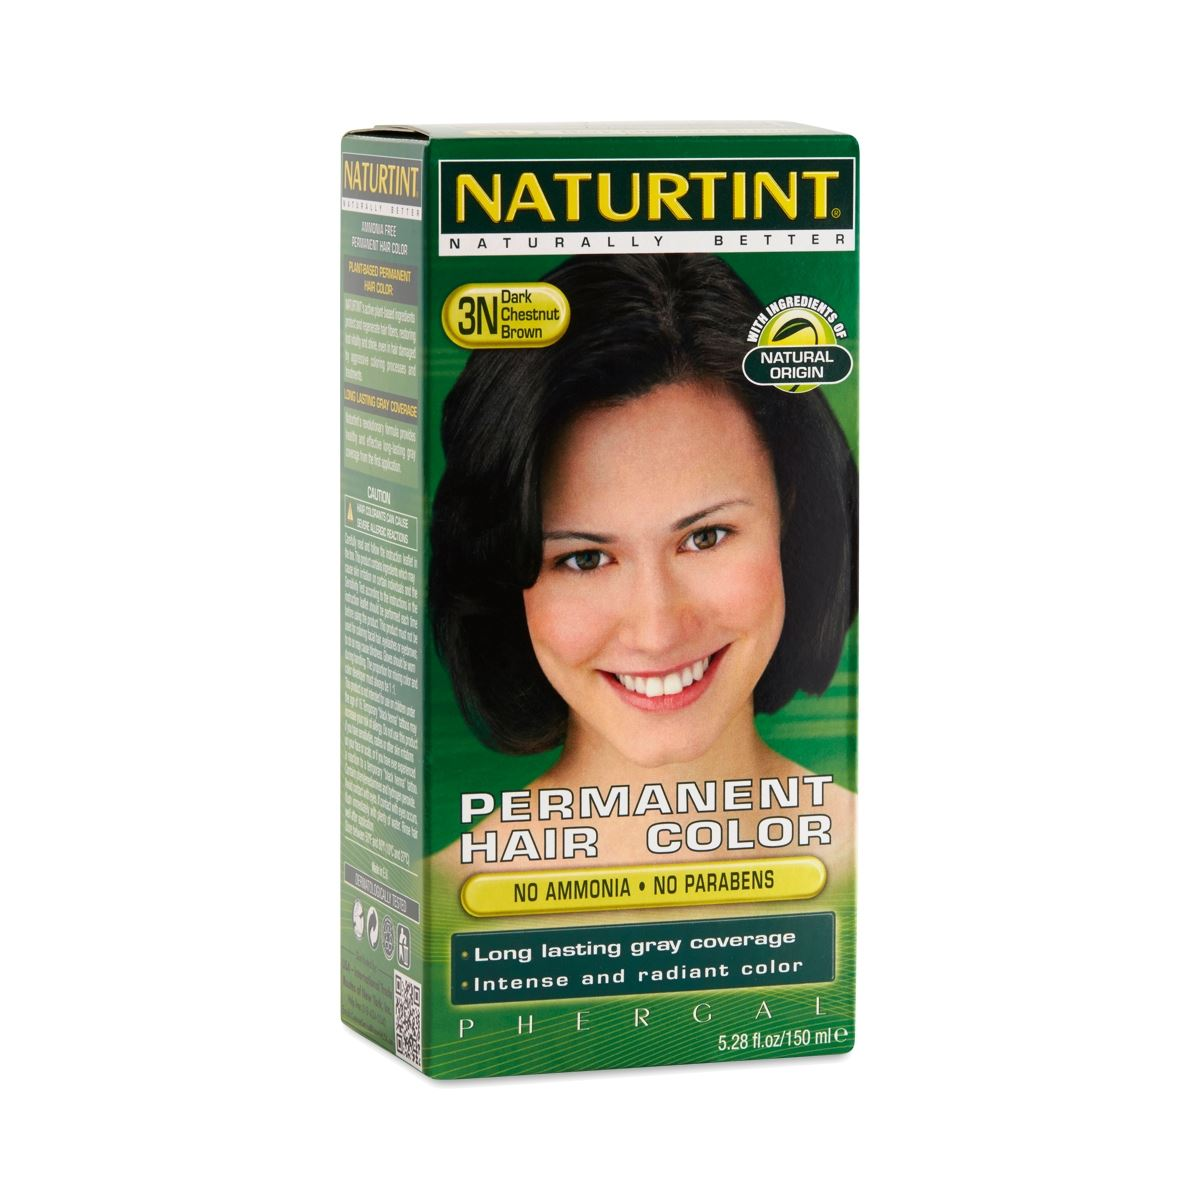 Naturtint Permanent Hair Color Dark Chestnut Brown 3n 661176010028